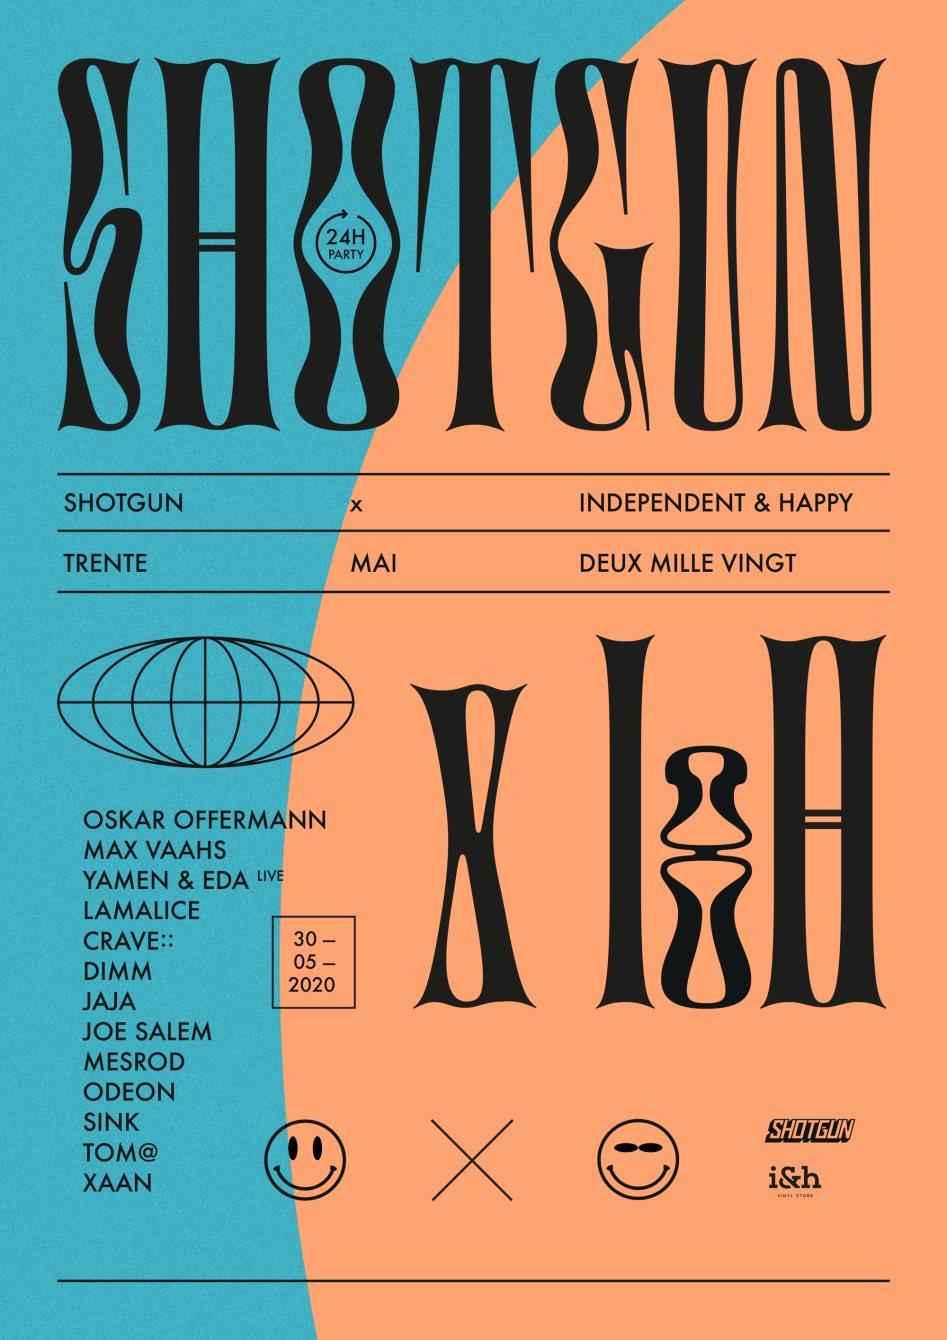 Shotgun X I&H W/ Oskar Offermann, Max Vaahs, Yamen & EDA - Flyer front